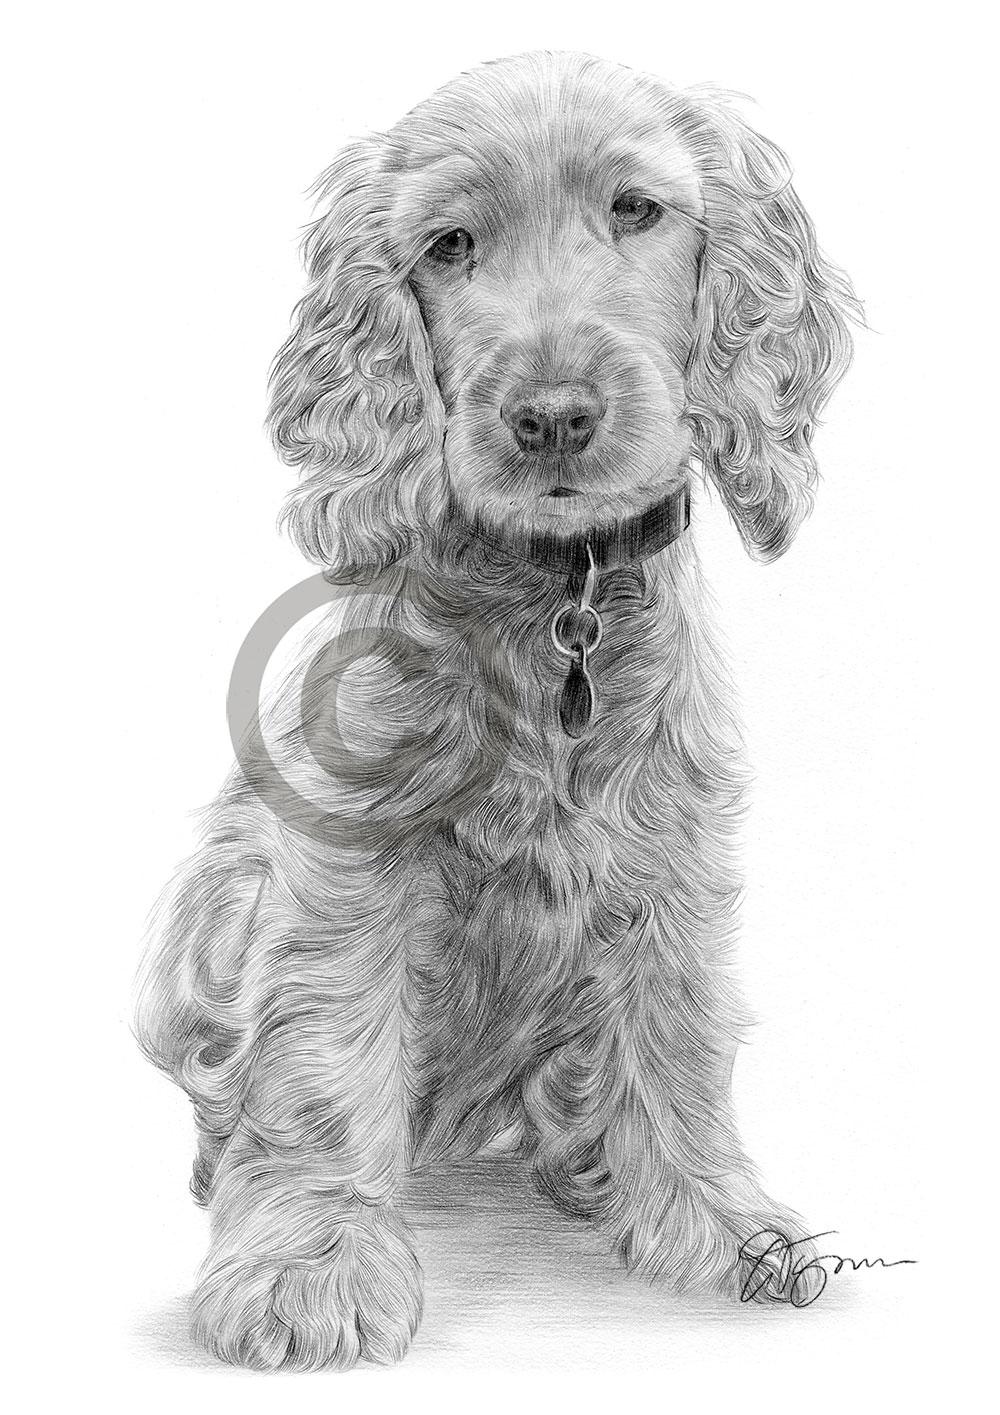 Cocker Spaniel Puppy Pencil Drawing Art Print A3 A4 Sizes Signed Pet Portrait Ebay